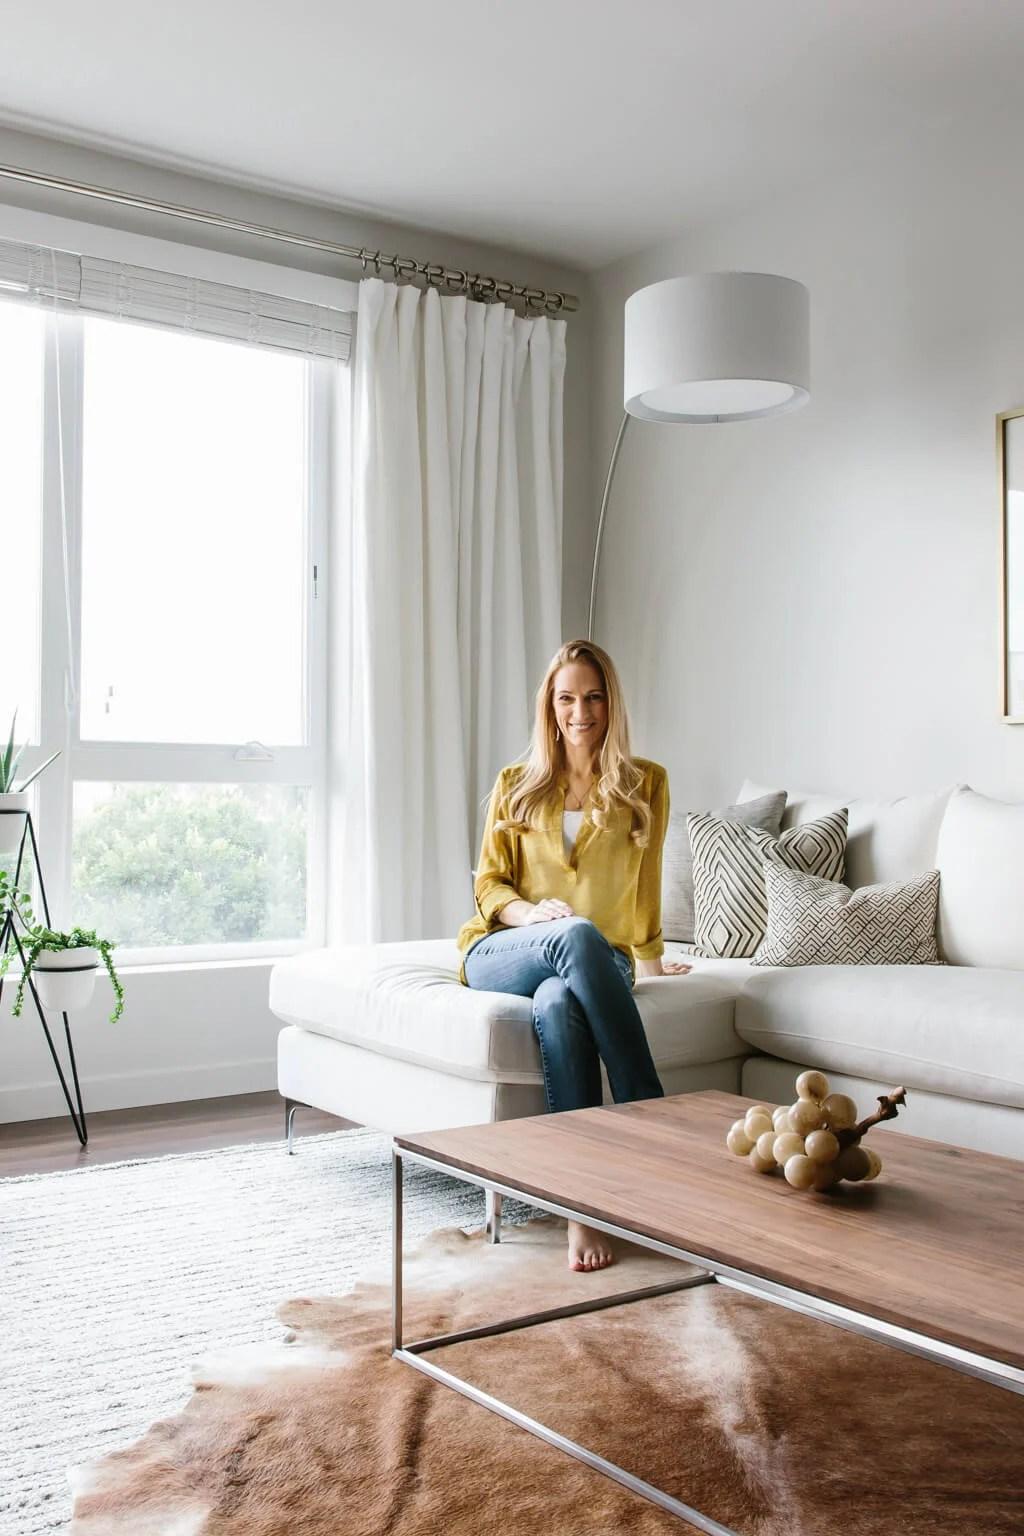 Designing my Modern and Minimalist Living Room with ... on Minimalist Living Room Design  id=70397